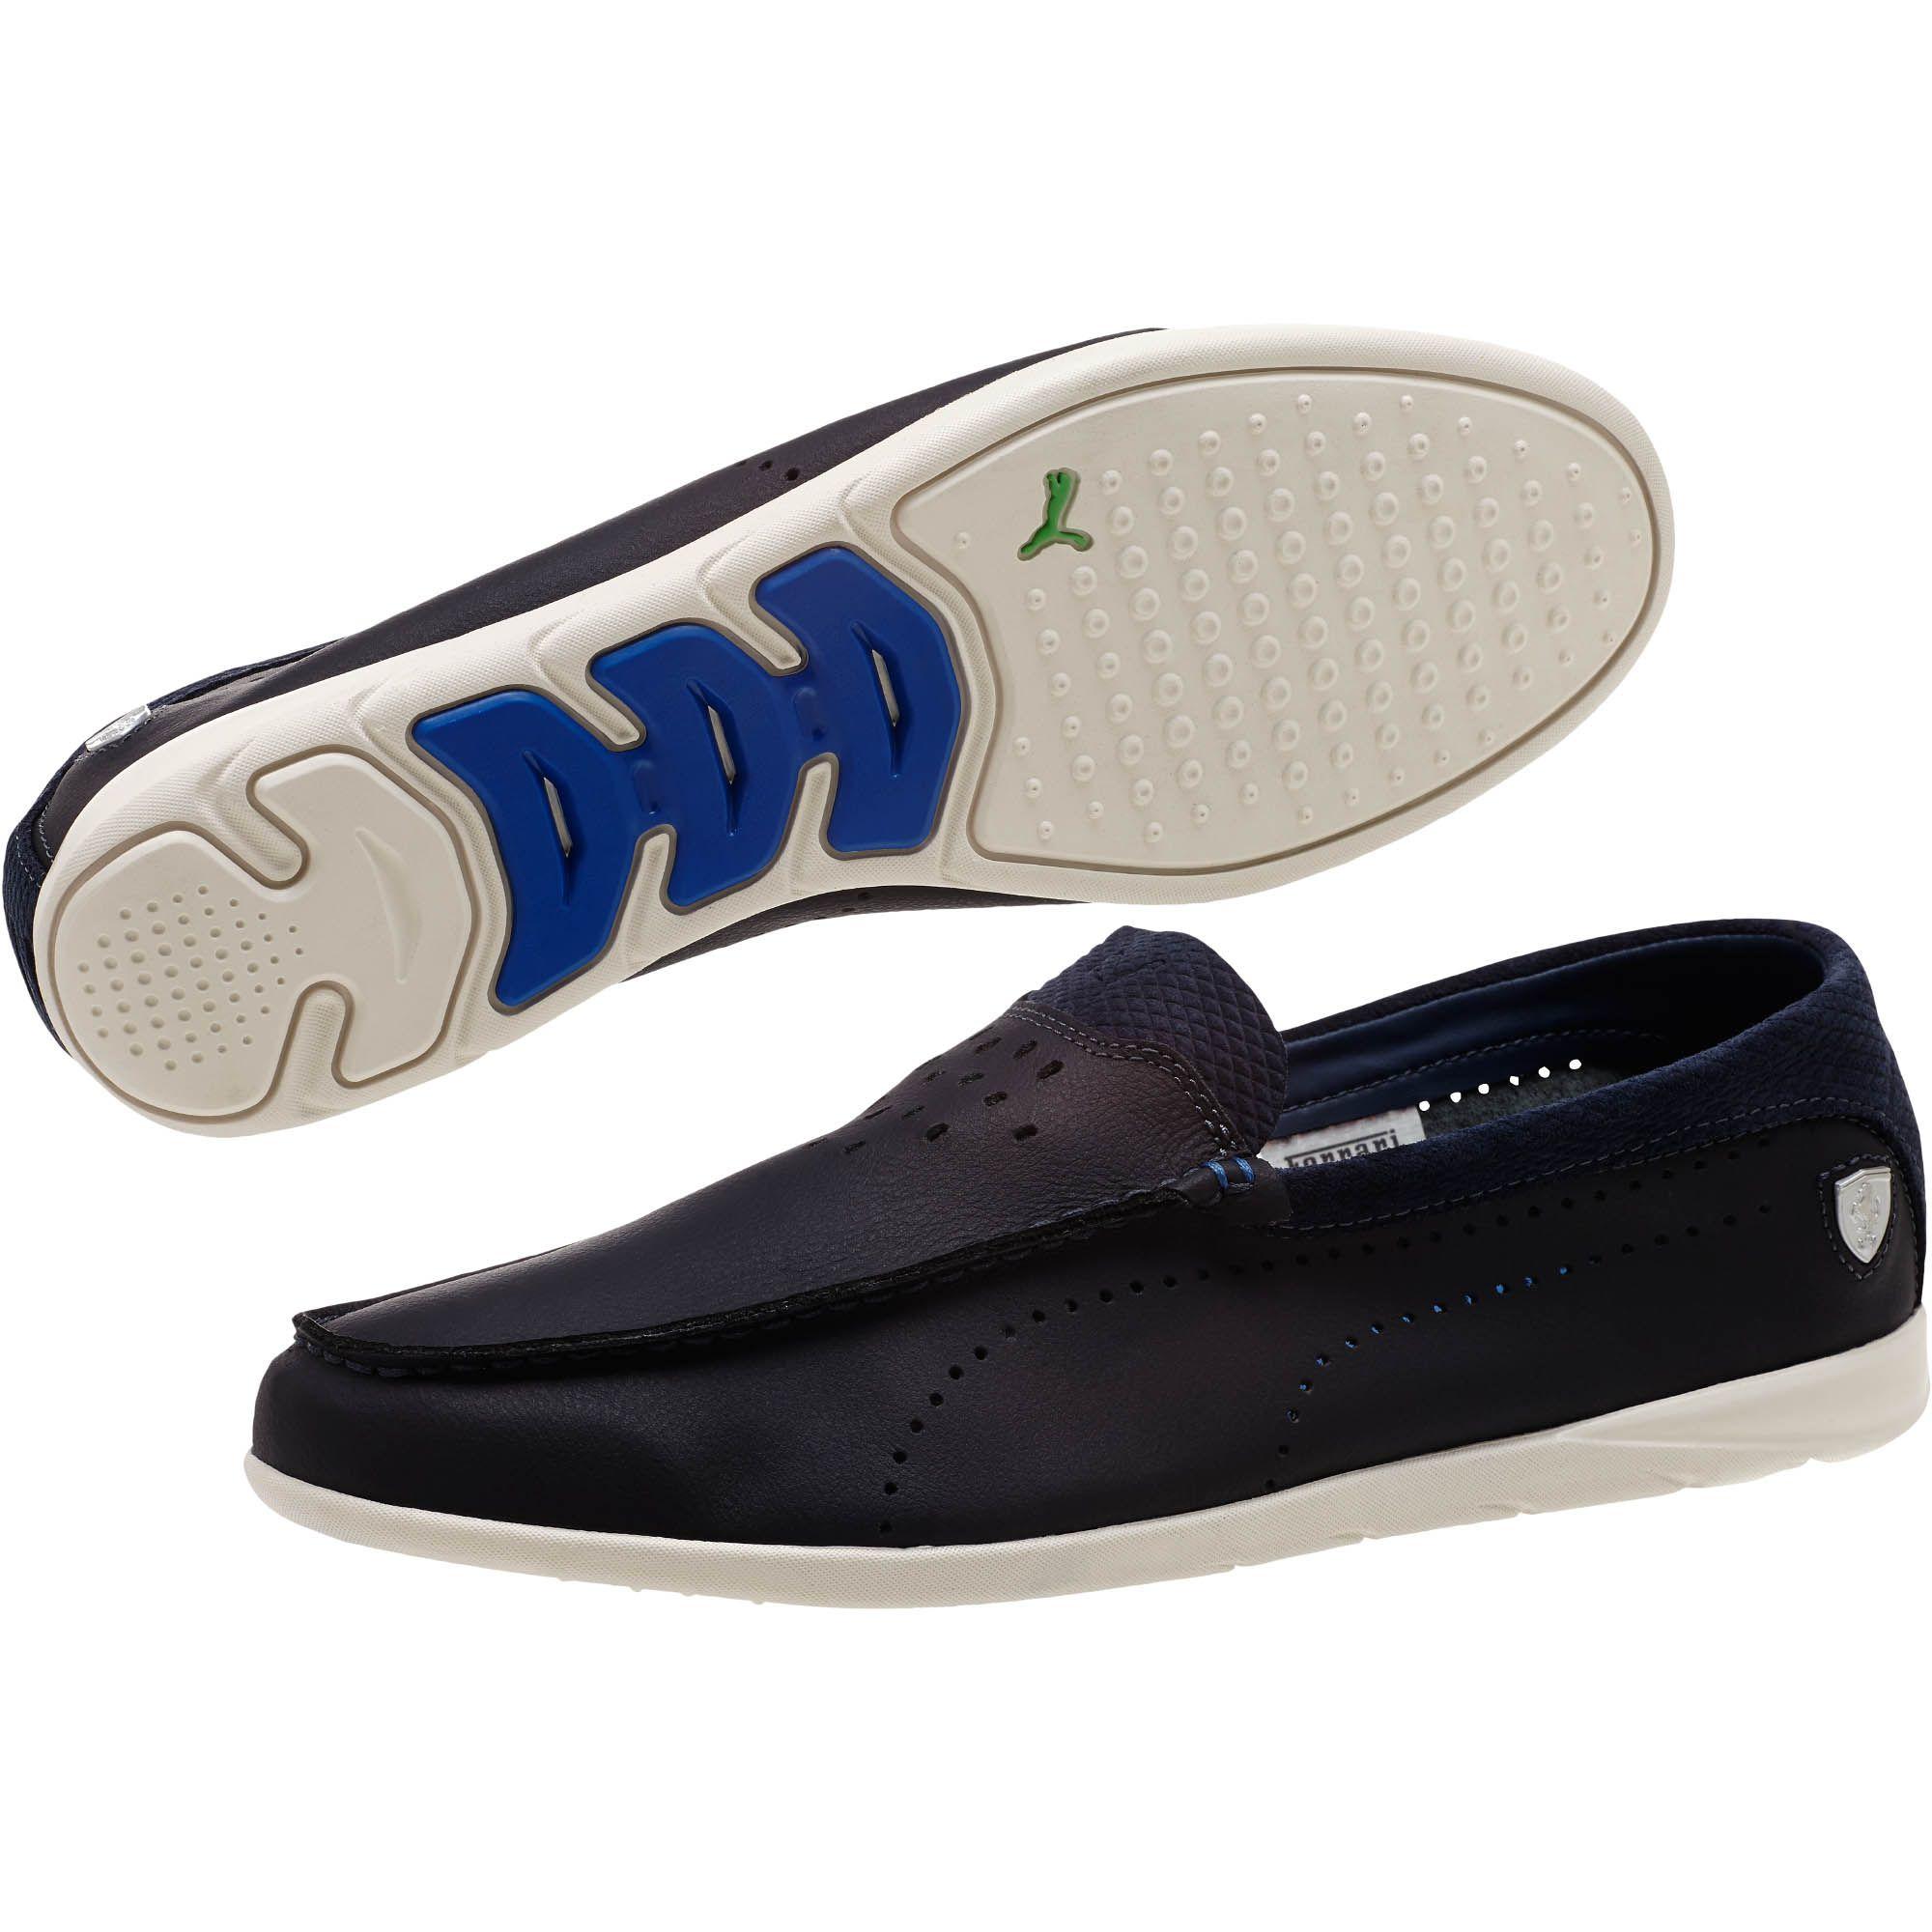 684d87db56c8 low cost lyst puma ferrari guida moccasin mens slip on shoes in blue for  men d4240